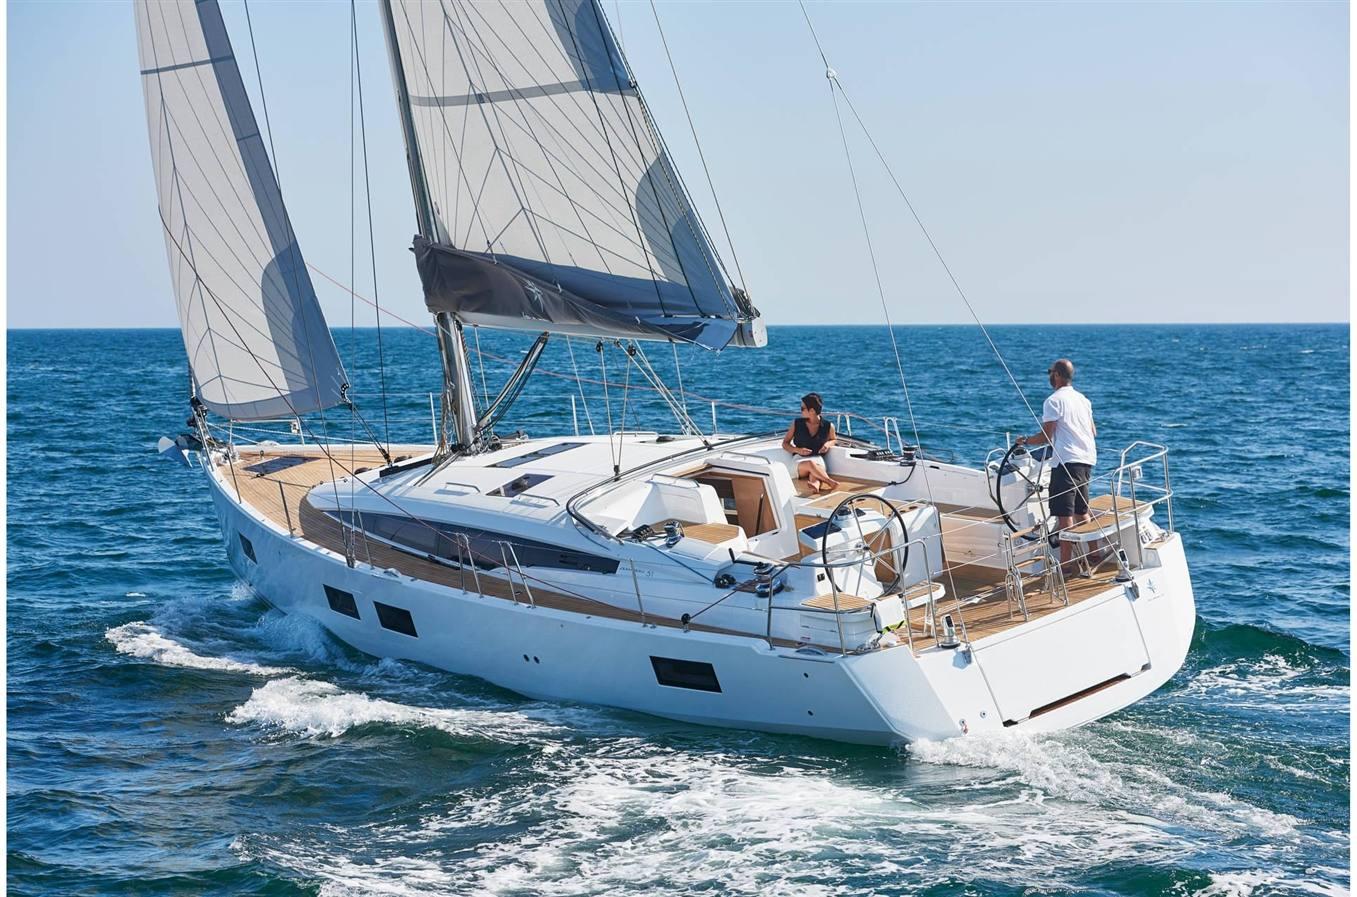 2019 Jeanneau Jeanneau 51 - Sara Bay Marina